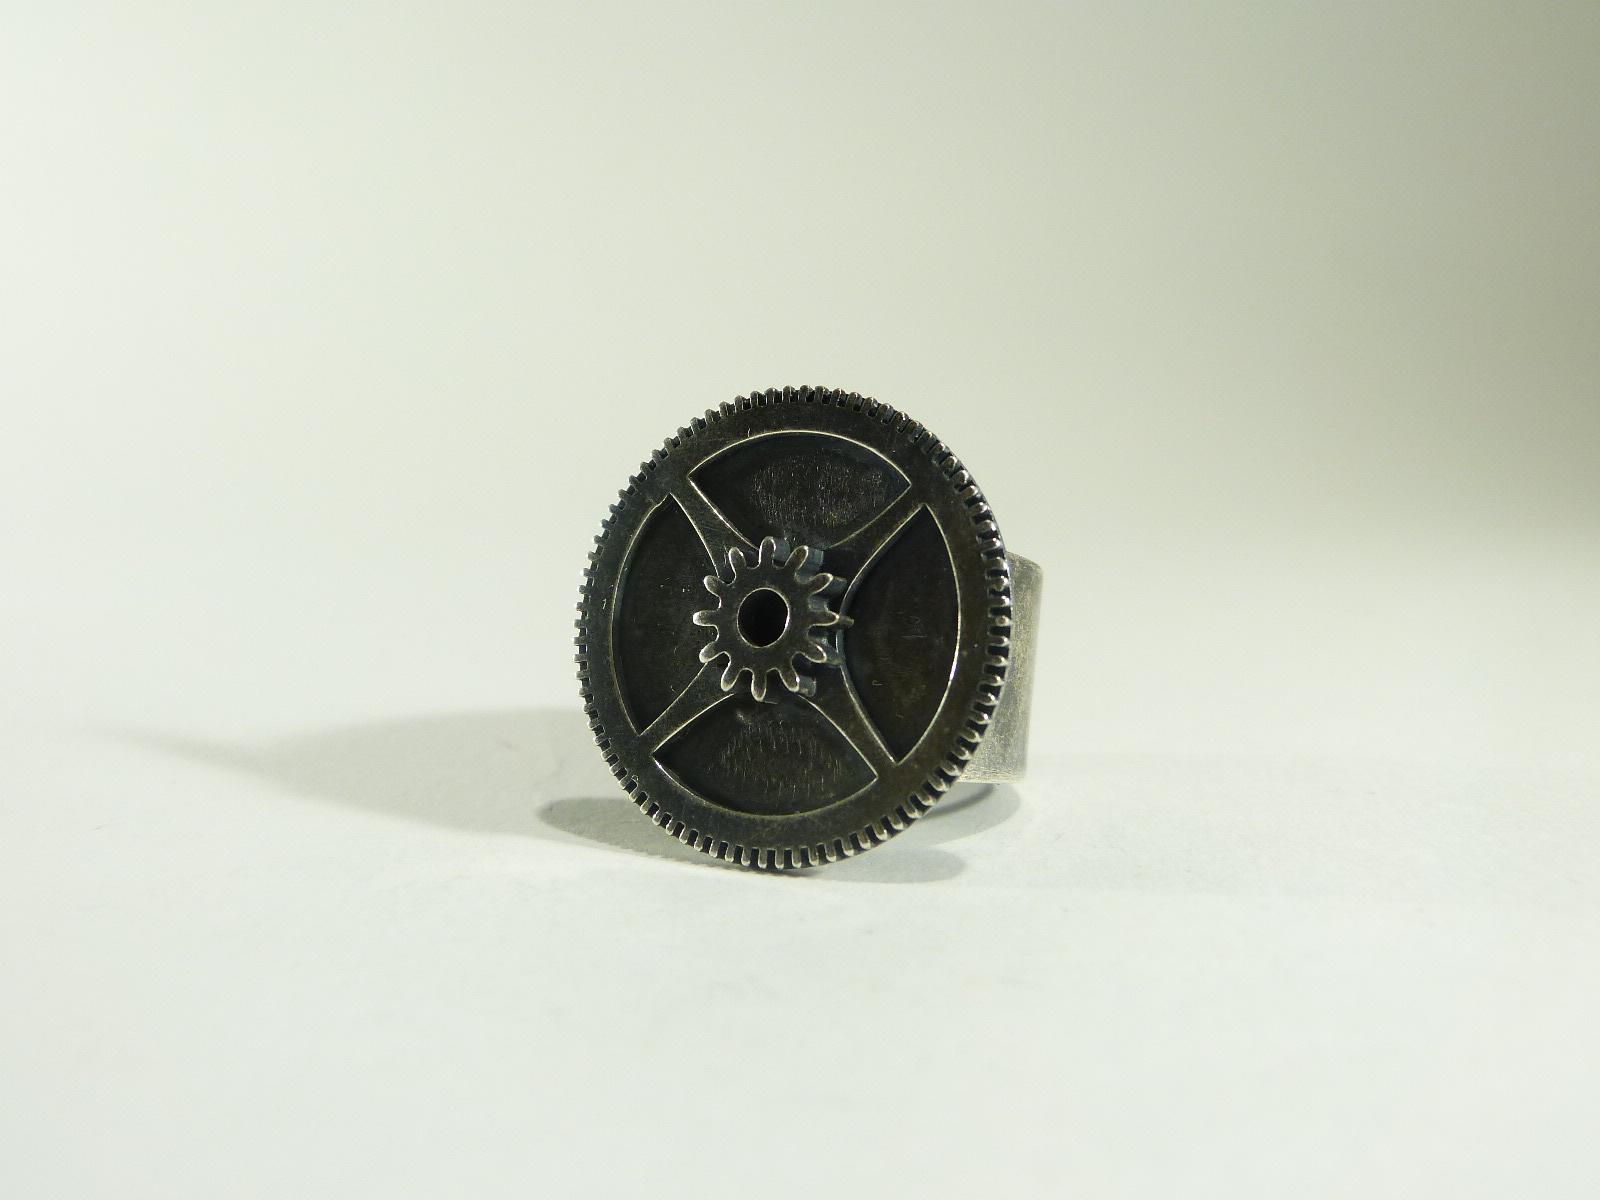 bague gros engrenage d'horloge